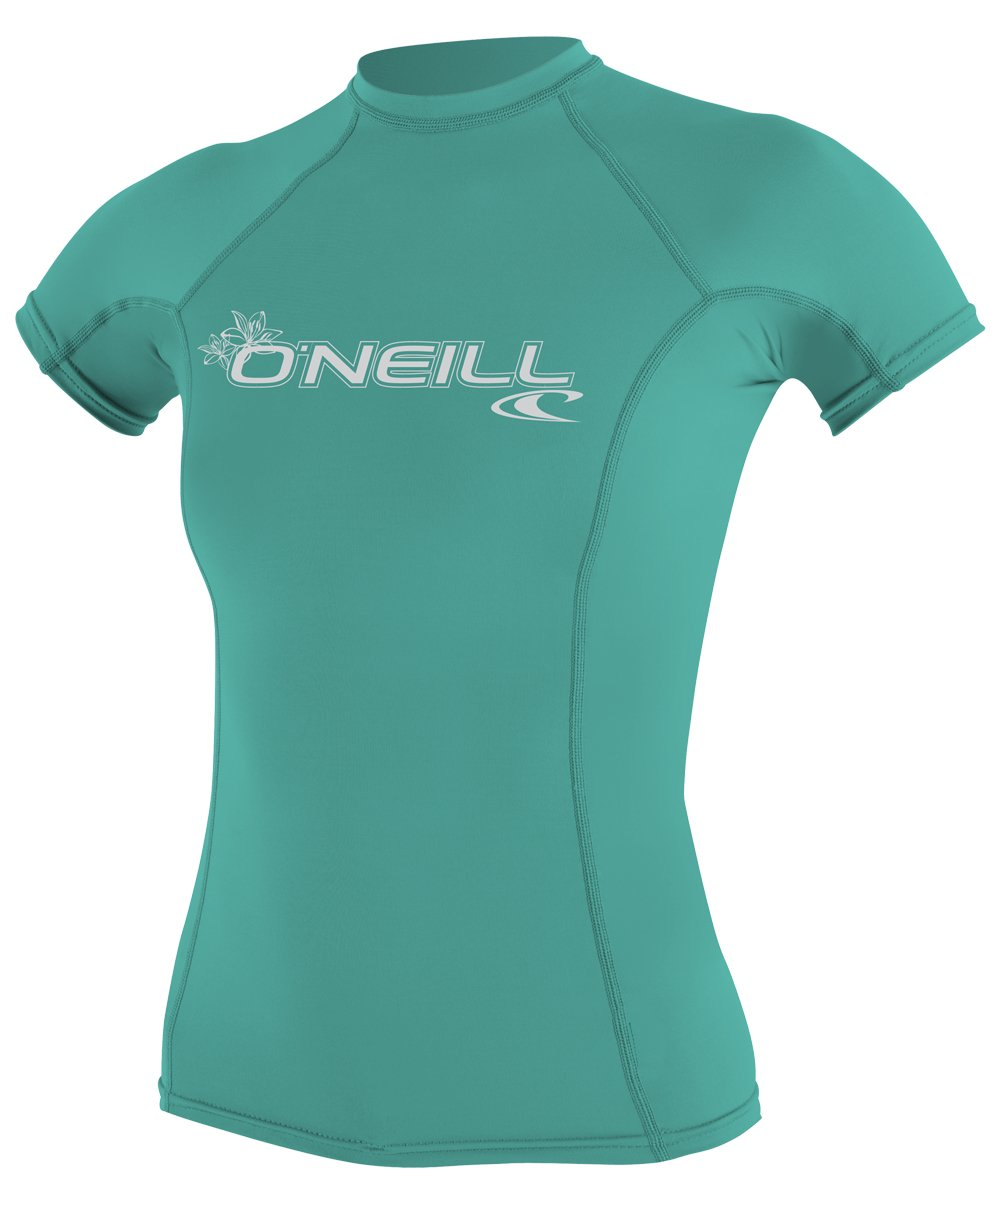 O'Neill Women's Basic 50+ Skins Short Sleeve Rash Guard, Light Aqua, Large by O'Neill Wetsuits